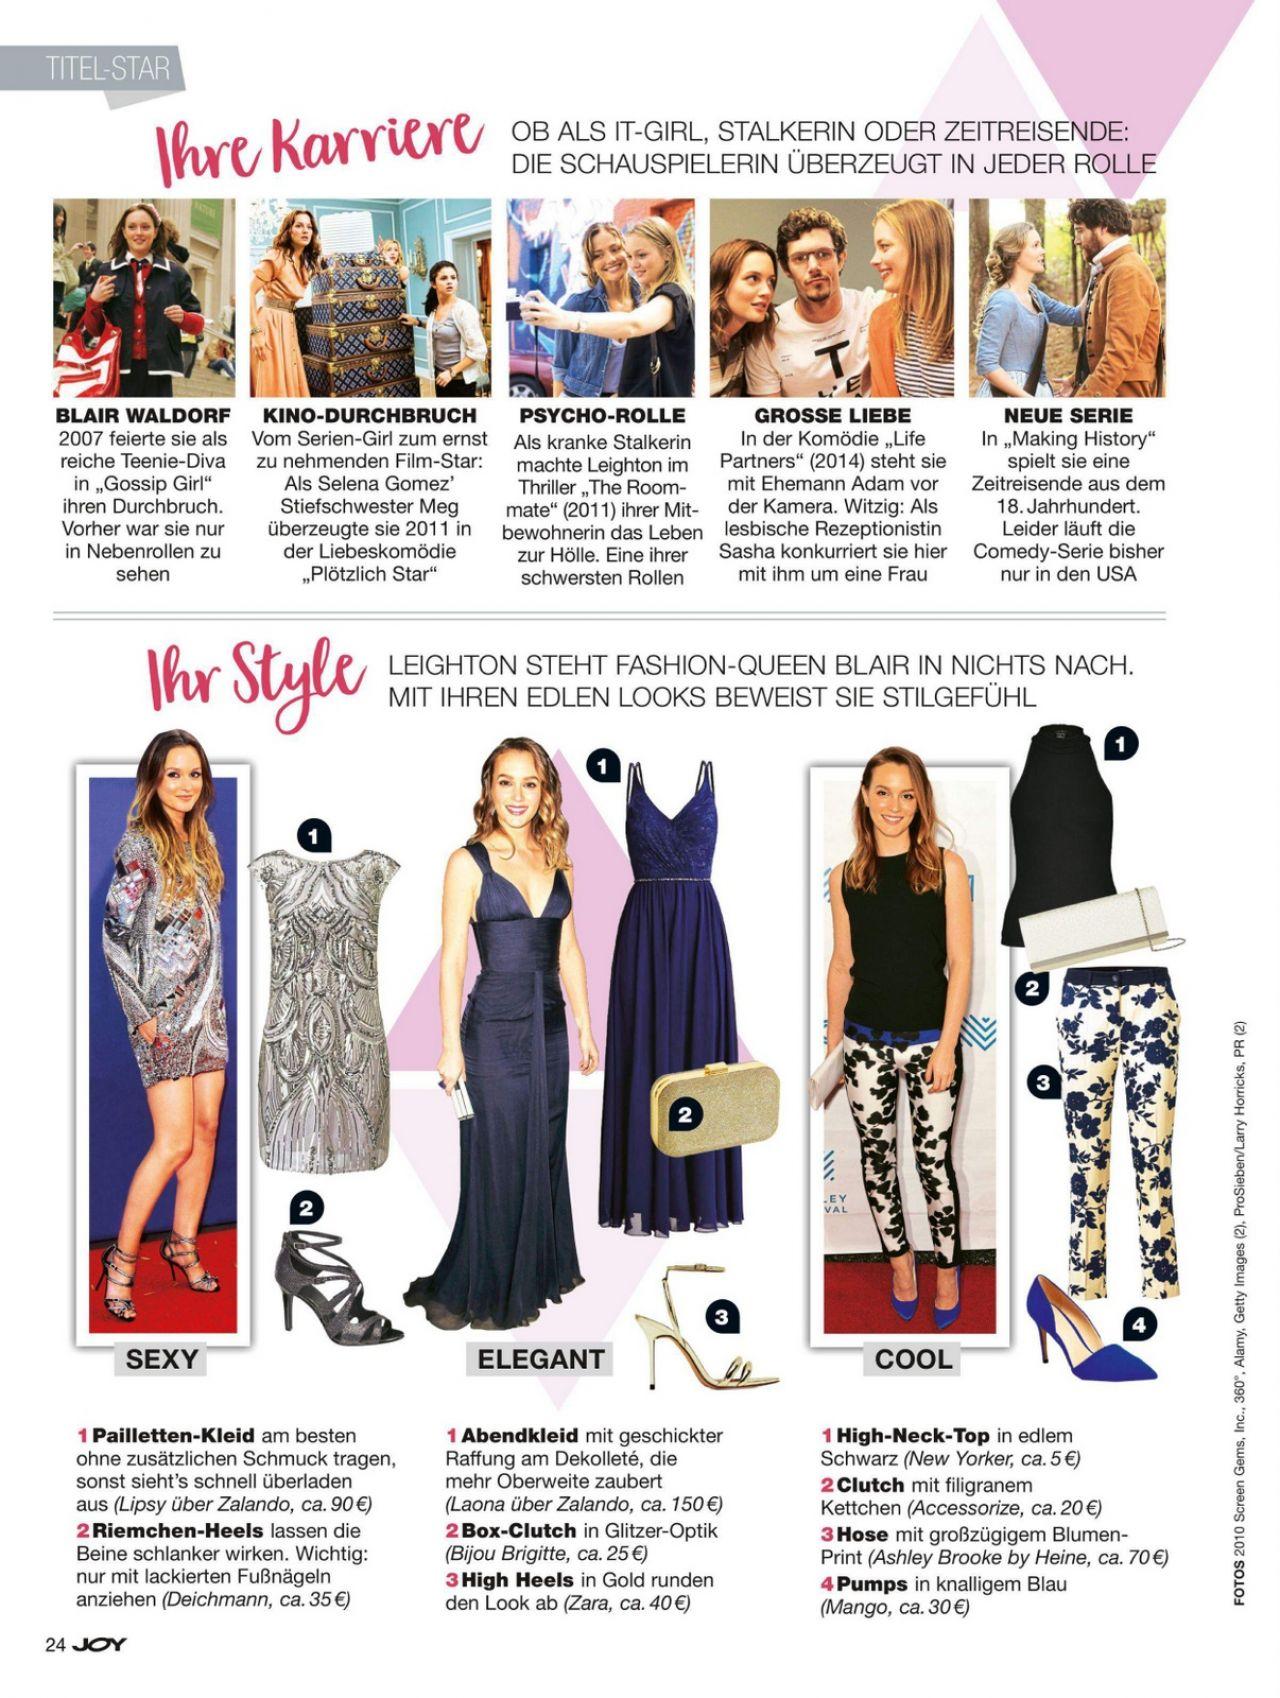 Leighton Meester - Joy Magazine Germany November 2017 Issue